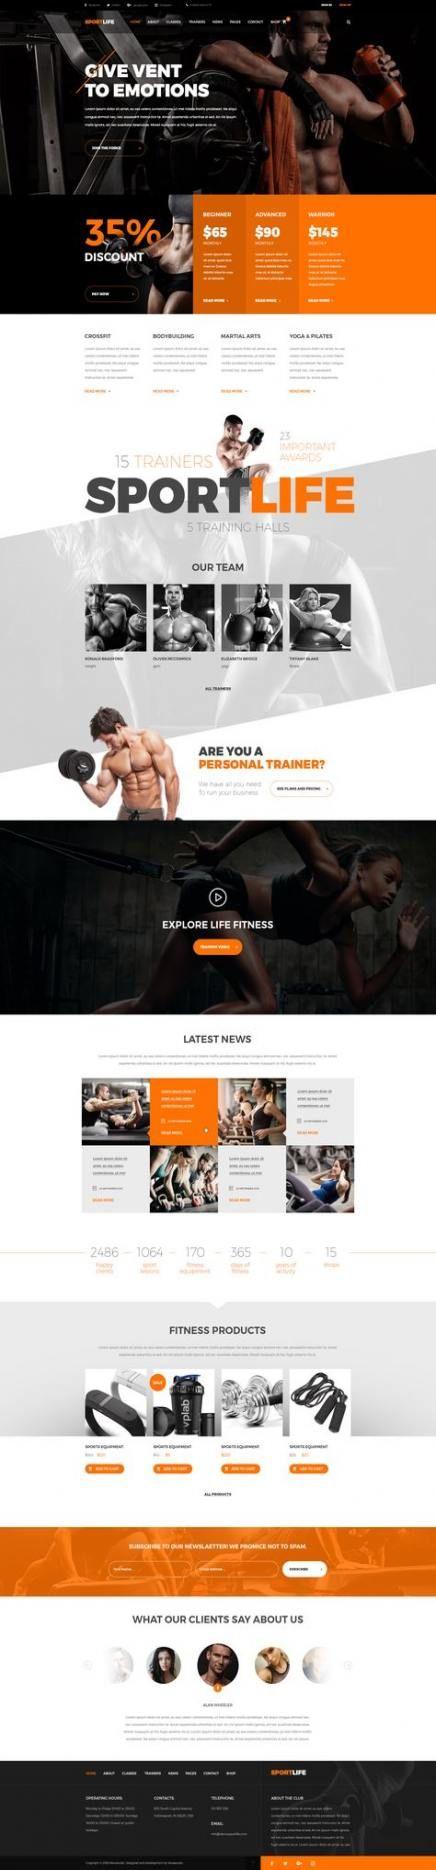 Super fitness design creative 15+ ideas #fitness